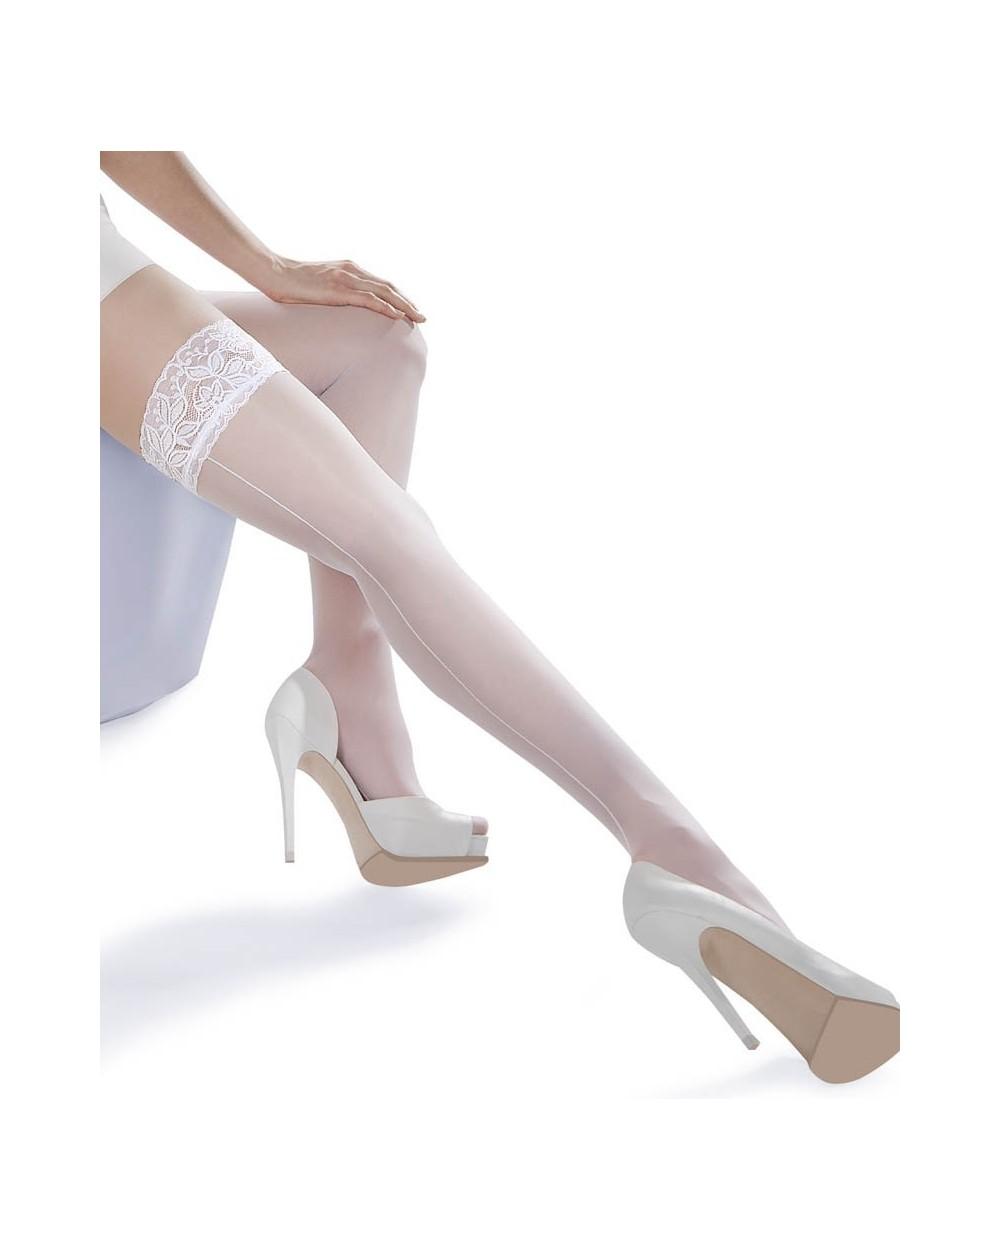 Bas couture blanc autofixant Lycra